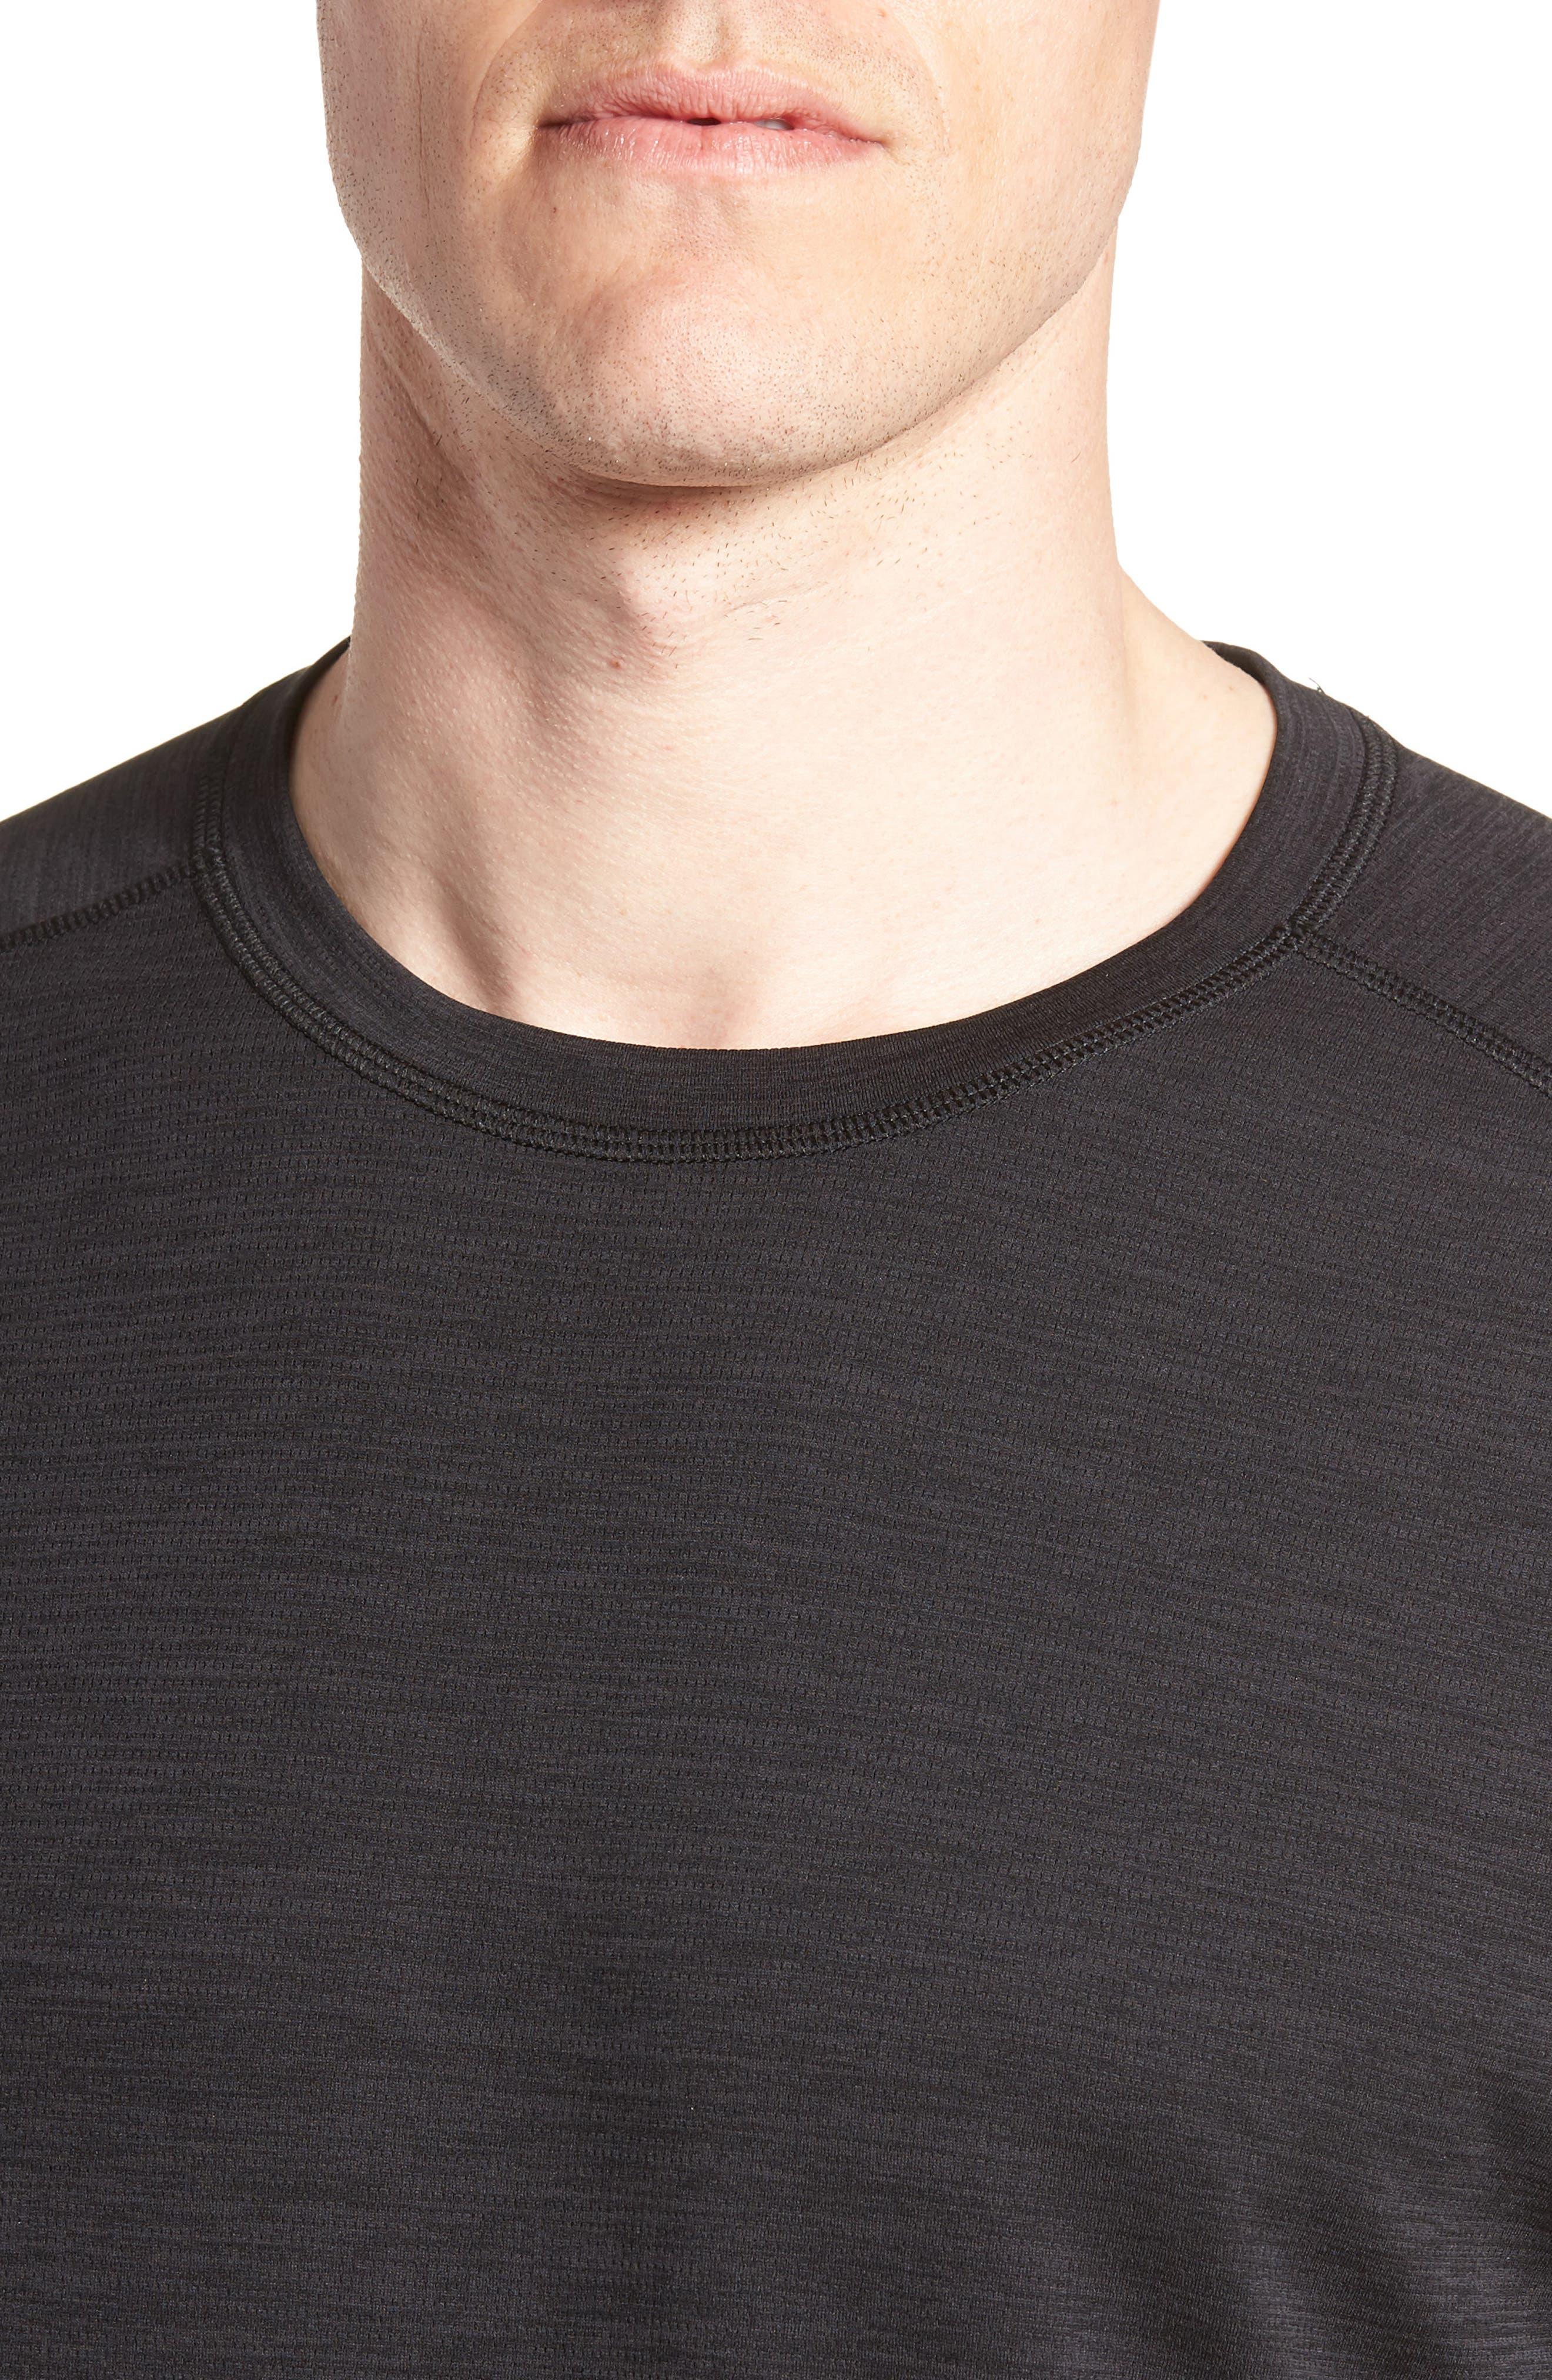 ZELLA, Kinoite Raglan Crewneck T-Shirt, Alternate thumbnail 5, color, BLACK OXIDE MELANGE